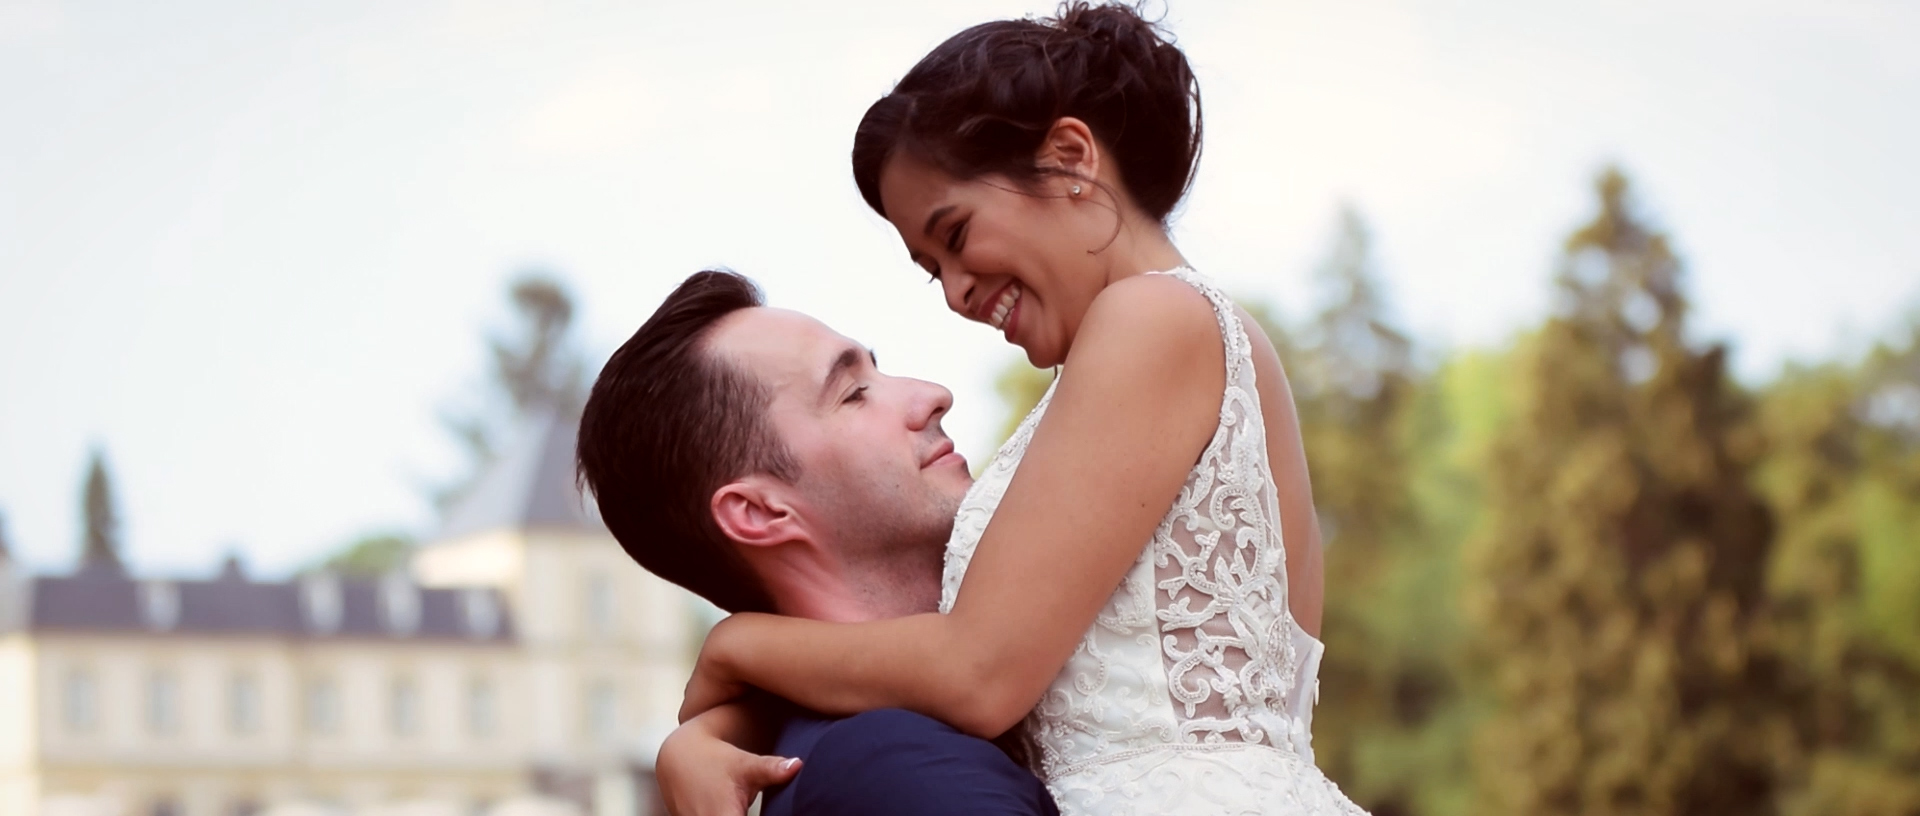 Vidéaste mariage Luxembourg - Wedding videographer - Chateau bois arlon